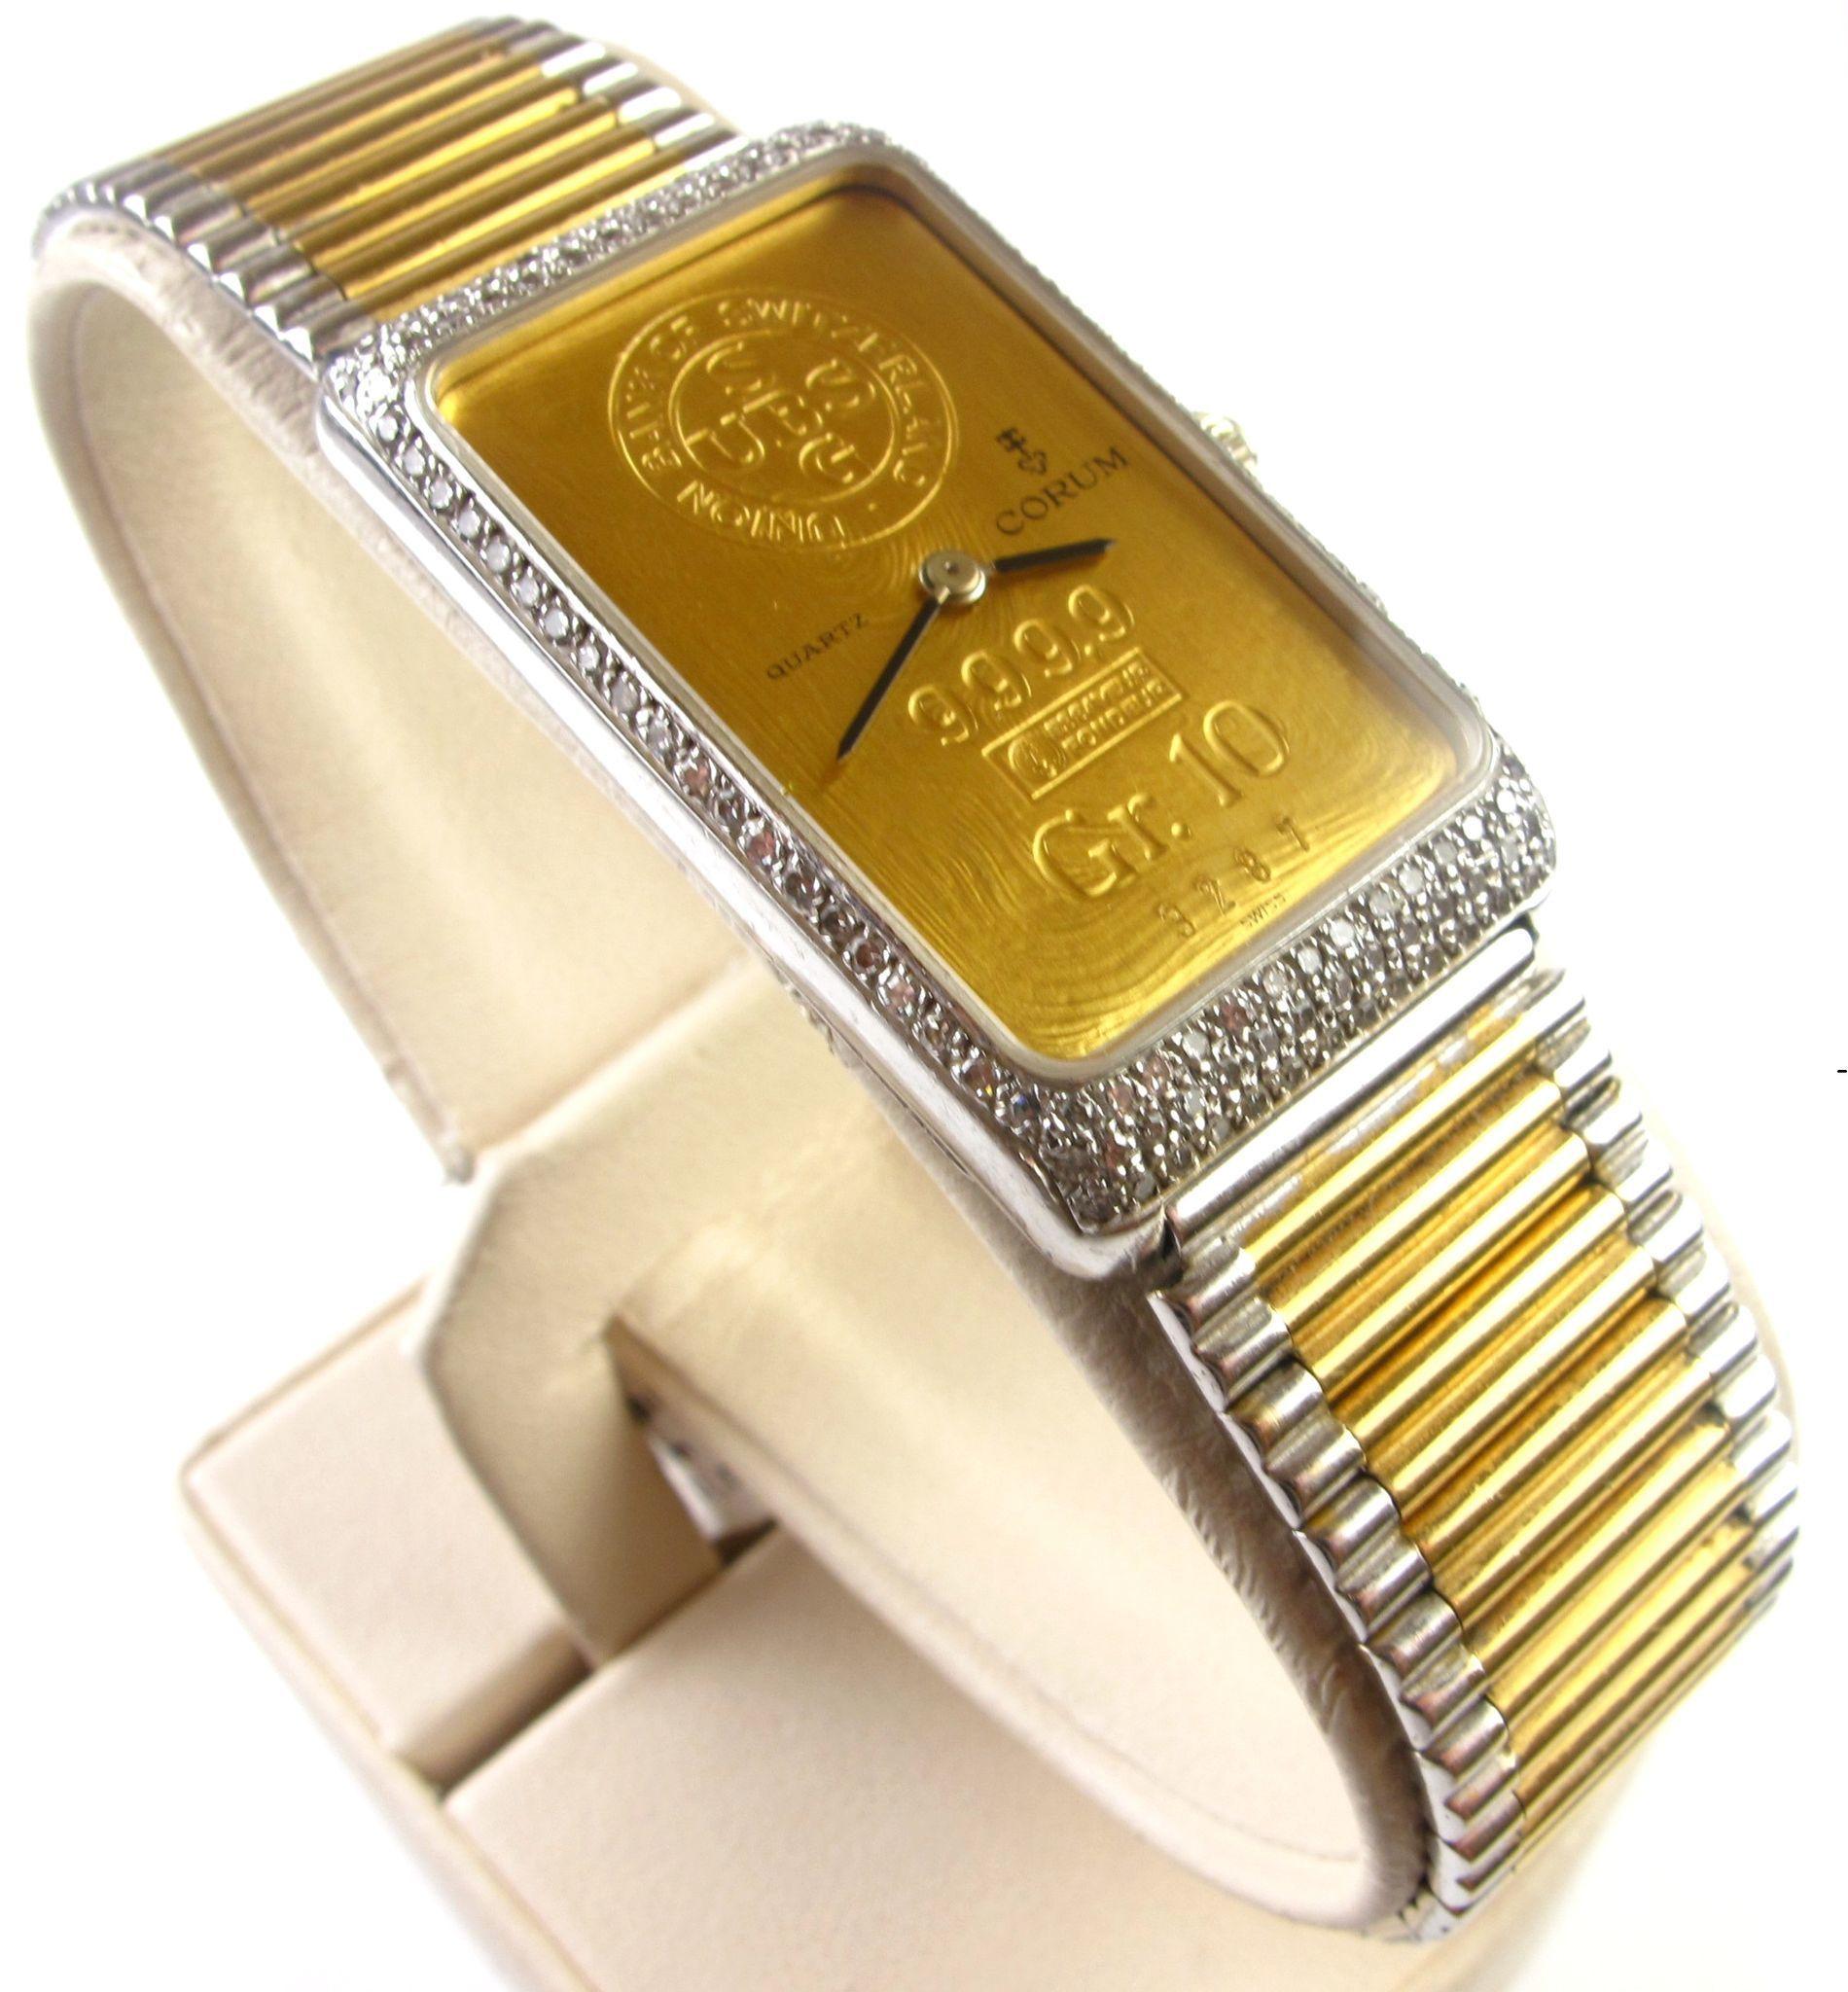 Vintage CORUM 18k Gold Ingot (10 Gram) Bullion Gents Wristwatch